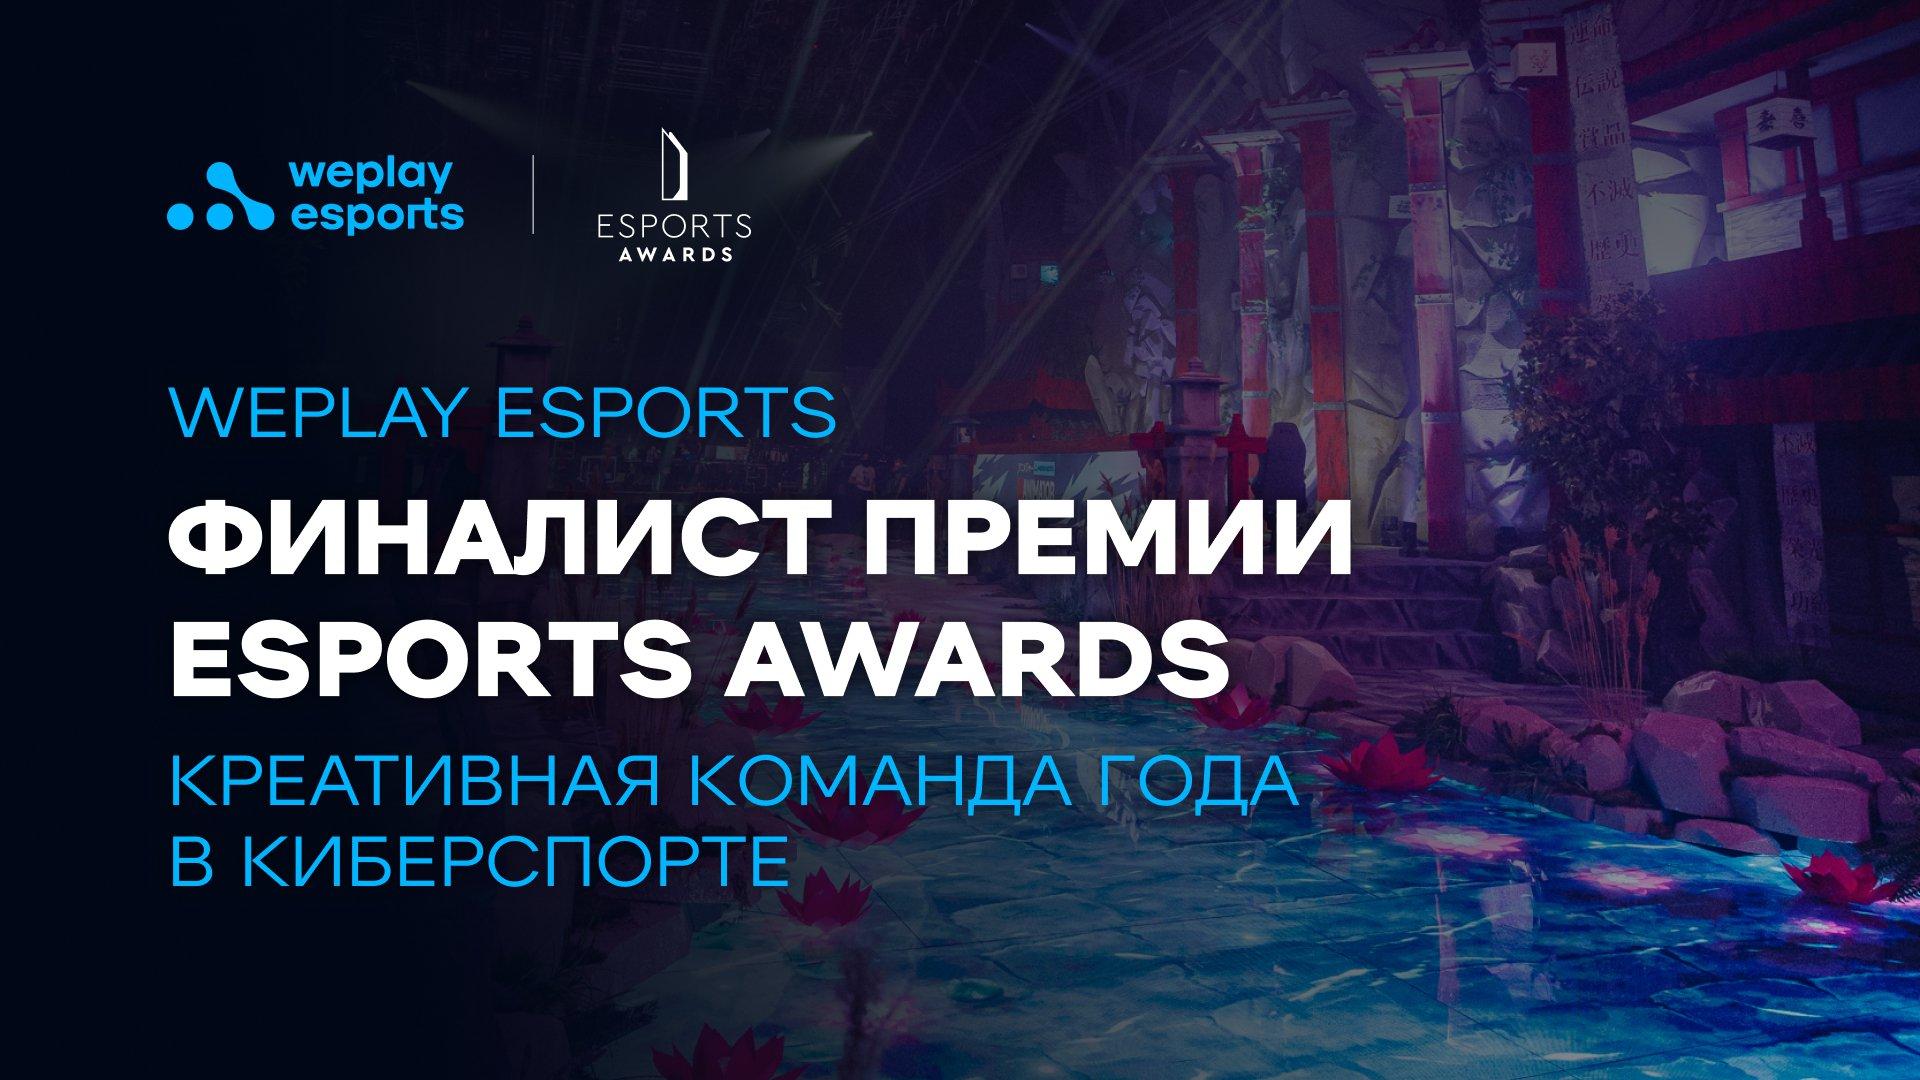 WePlay Esports – финалист премии Esports Awards. Фото: WePlay Holding